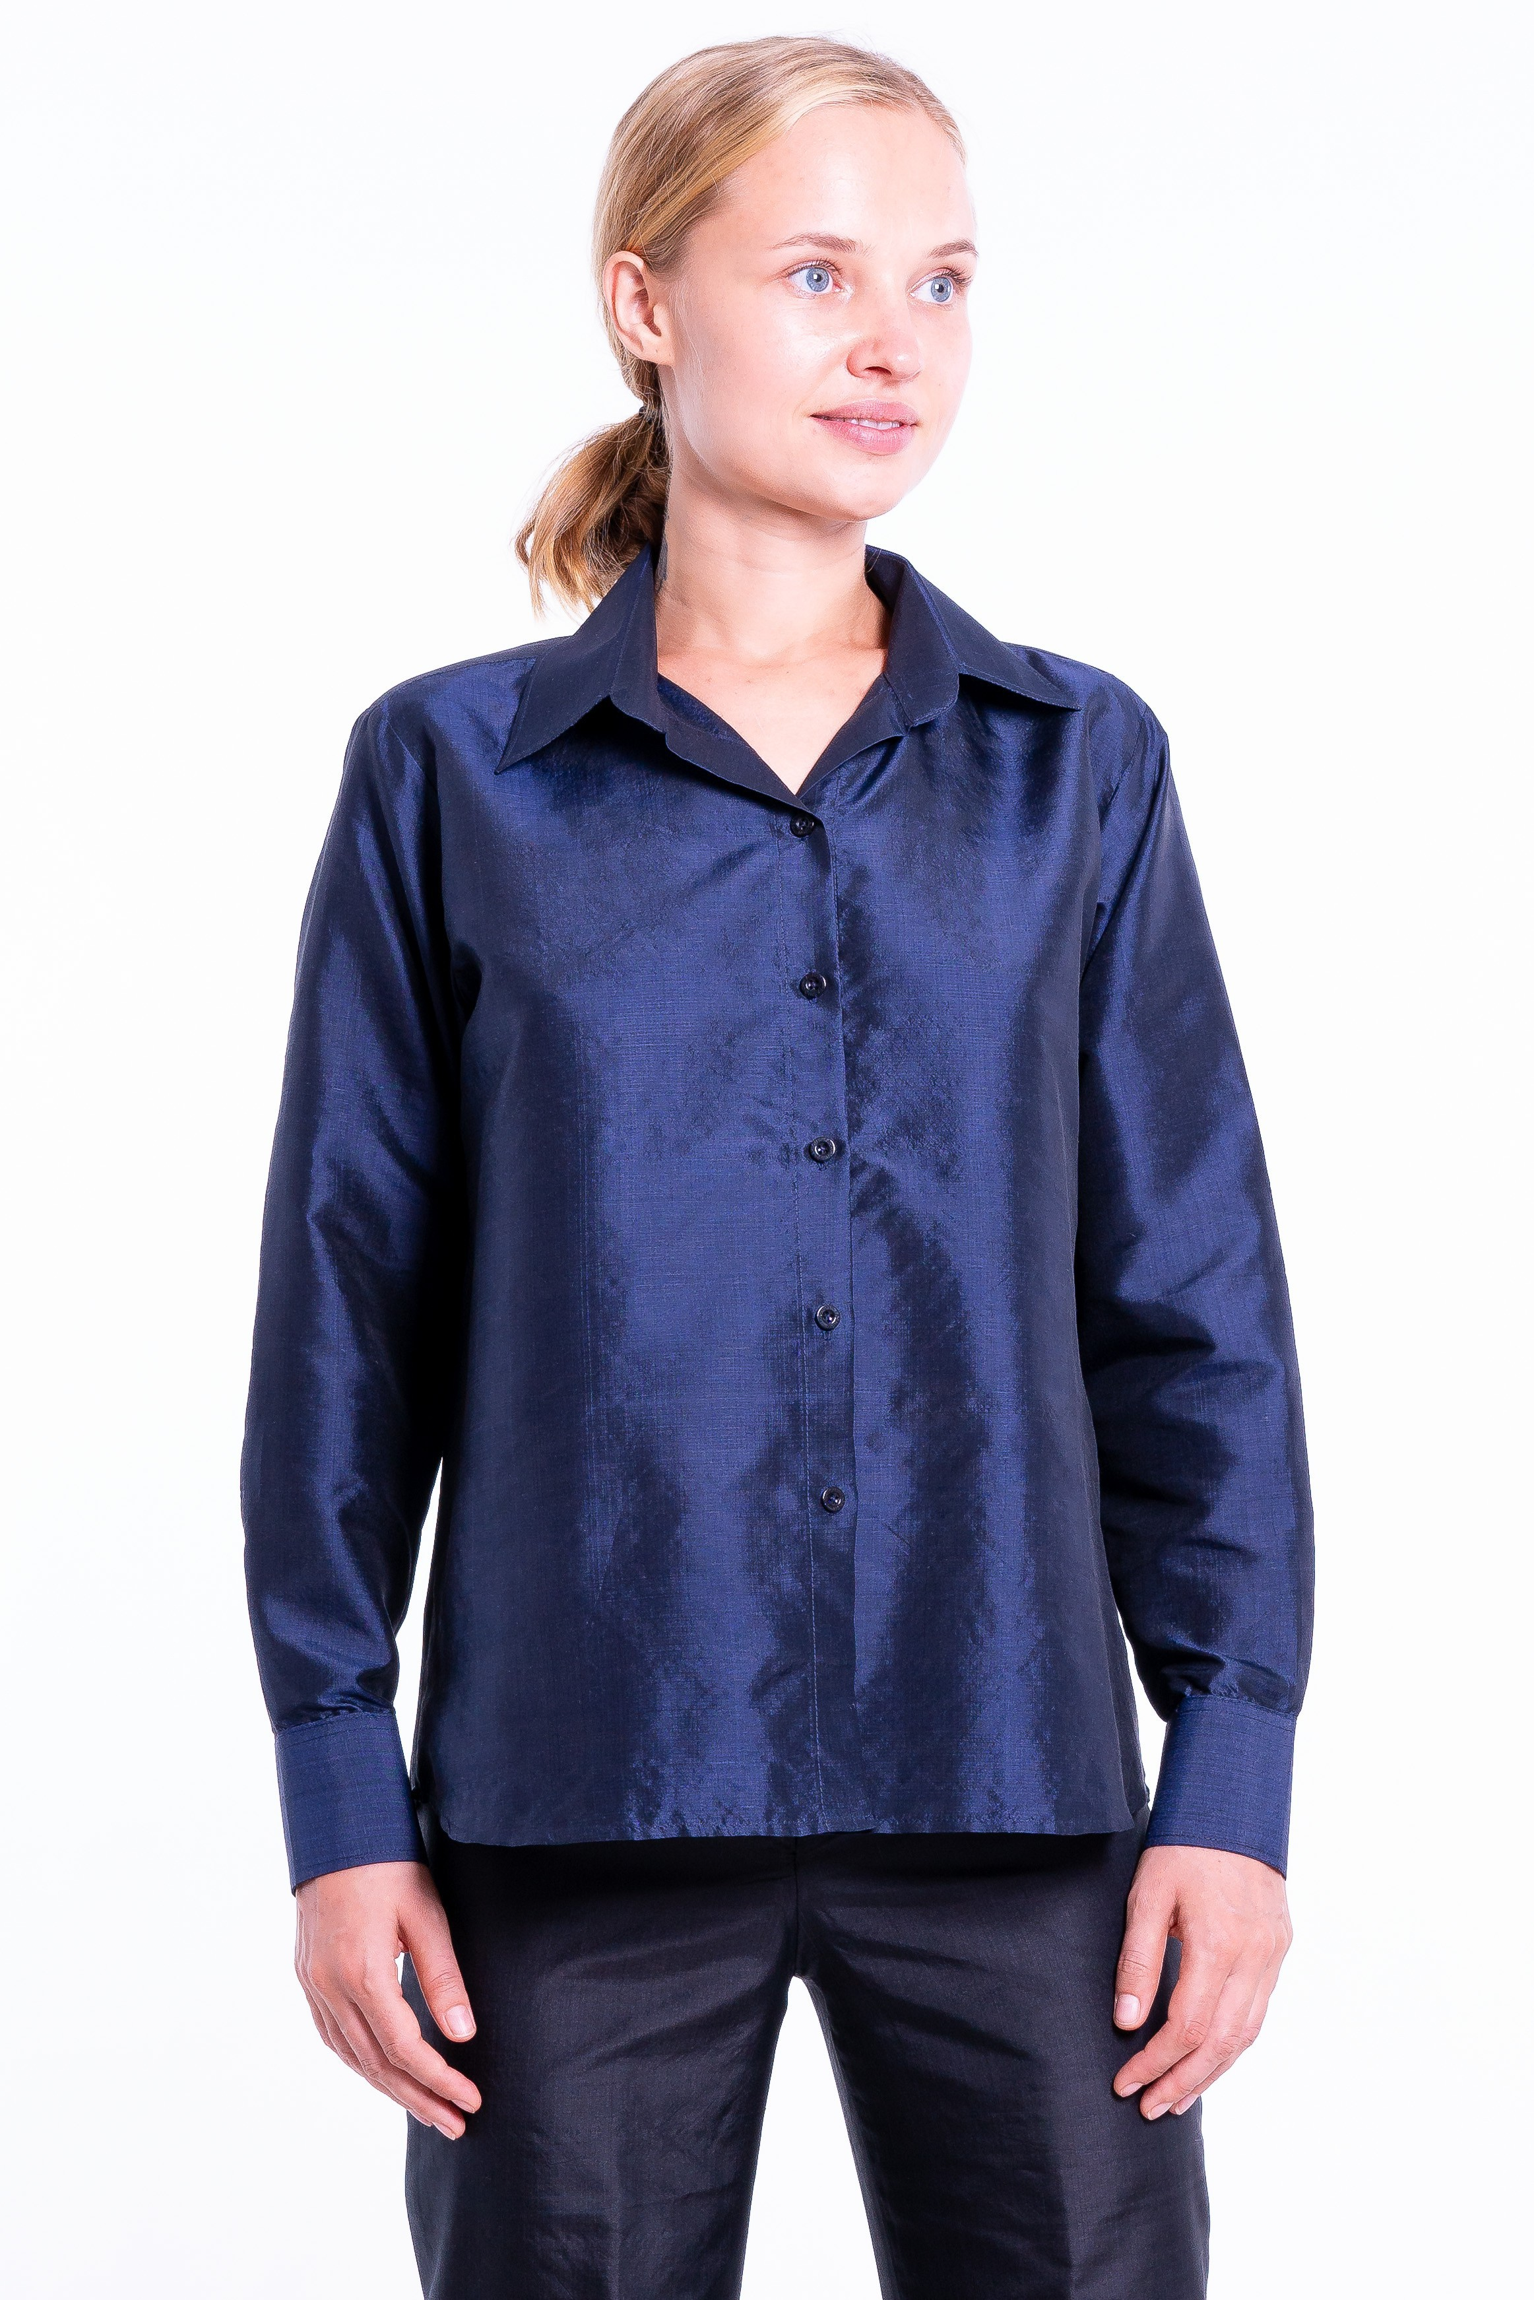 navy blue silk shirt, handwoven in Cambodia